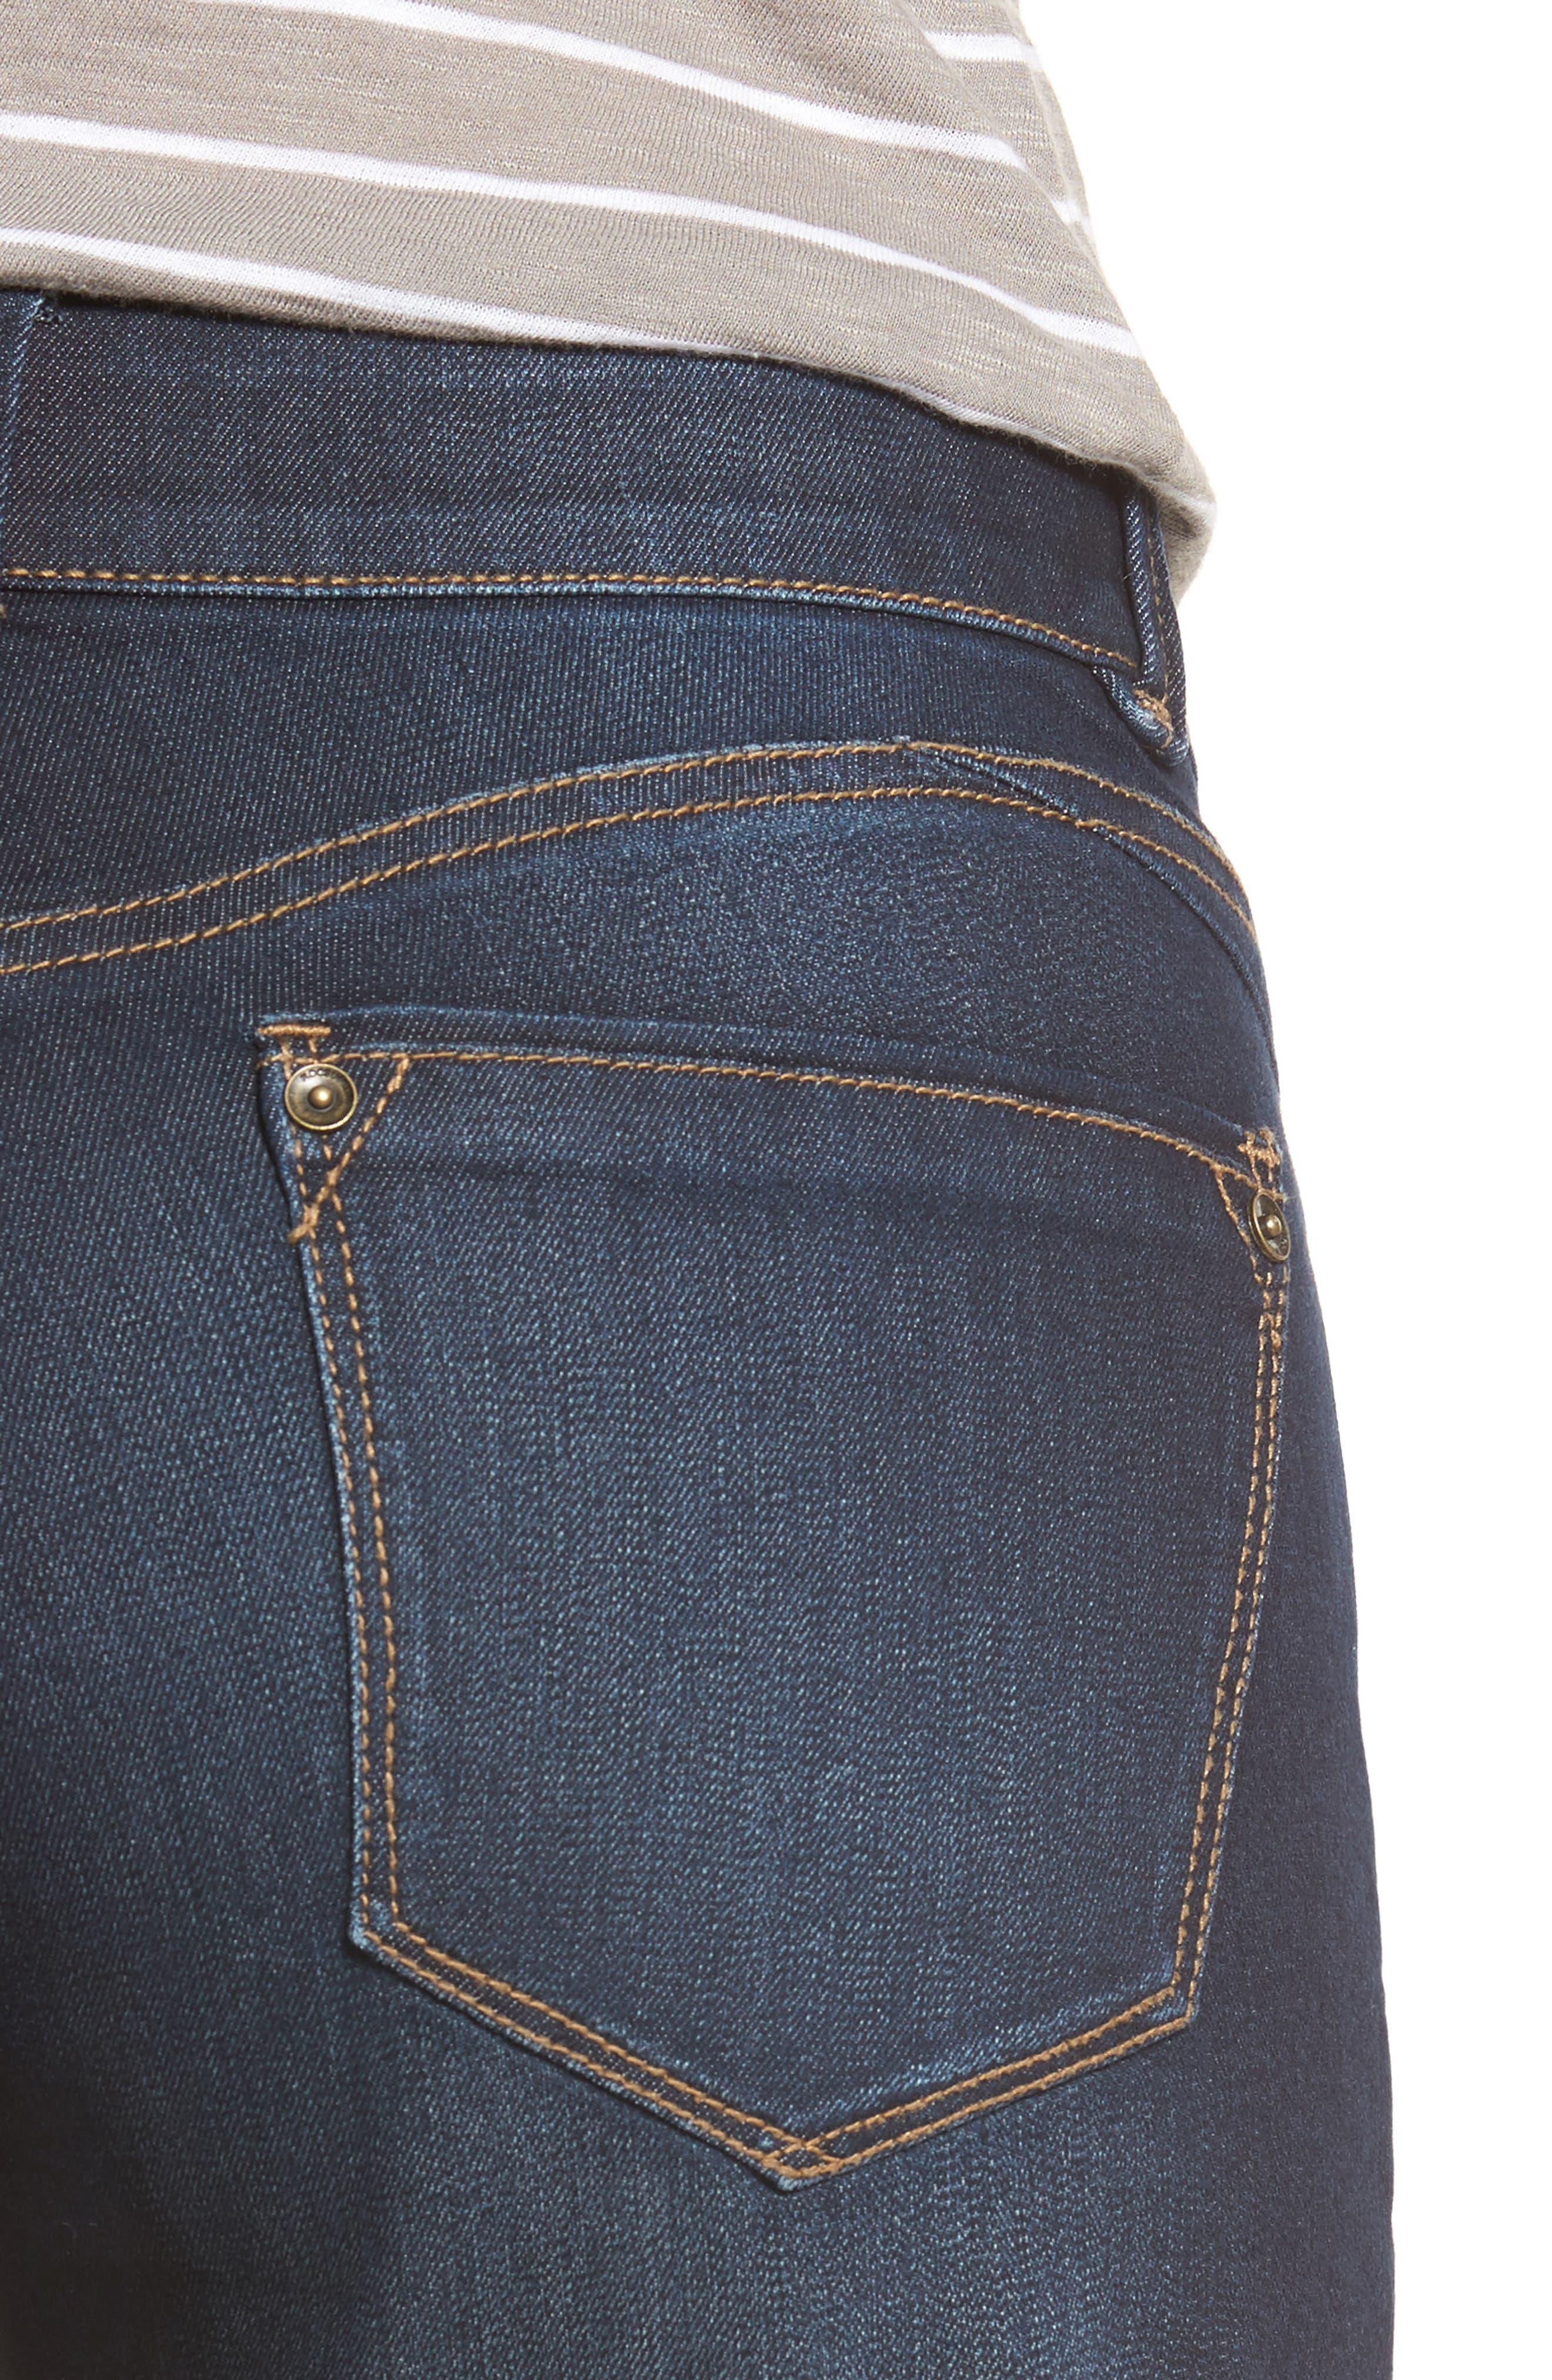 Ab-solution Cuffed Denim Shorts,                             Alternate thumbnail 4, color,                             402